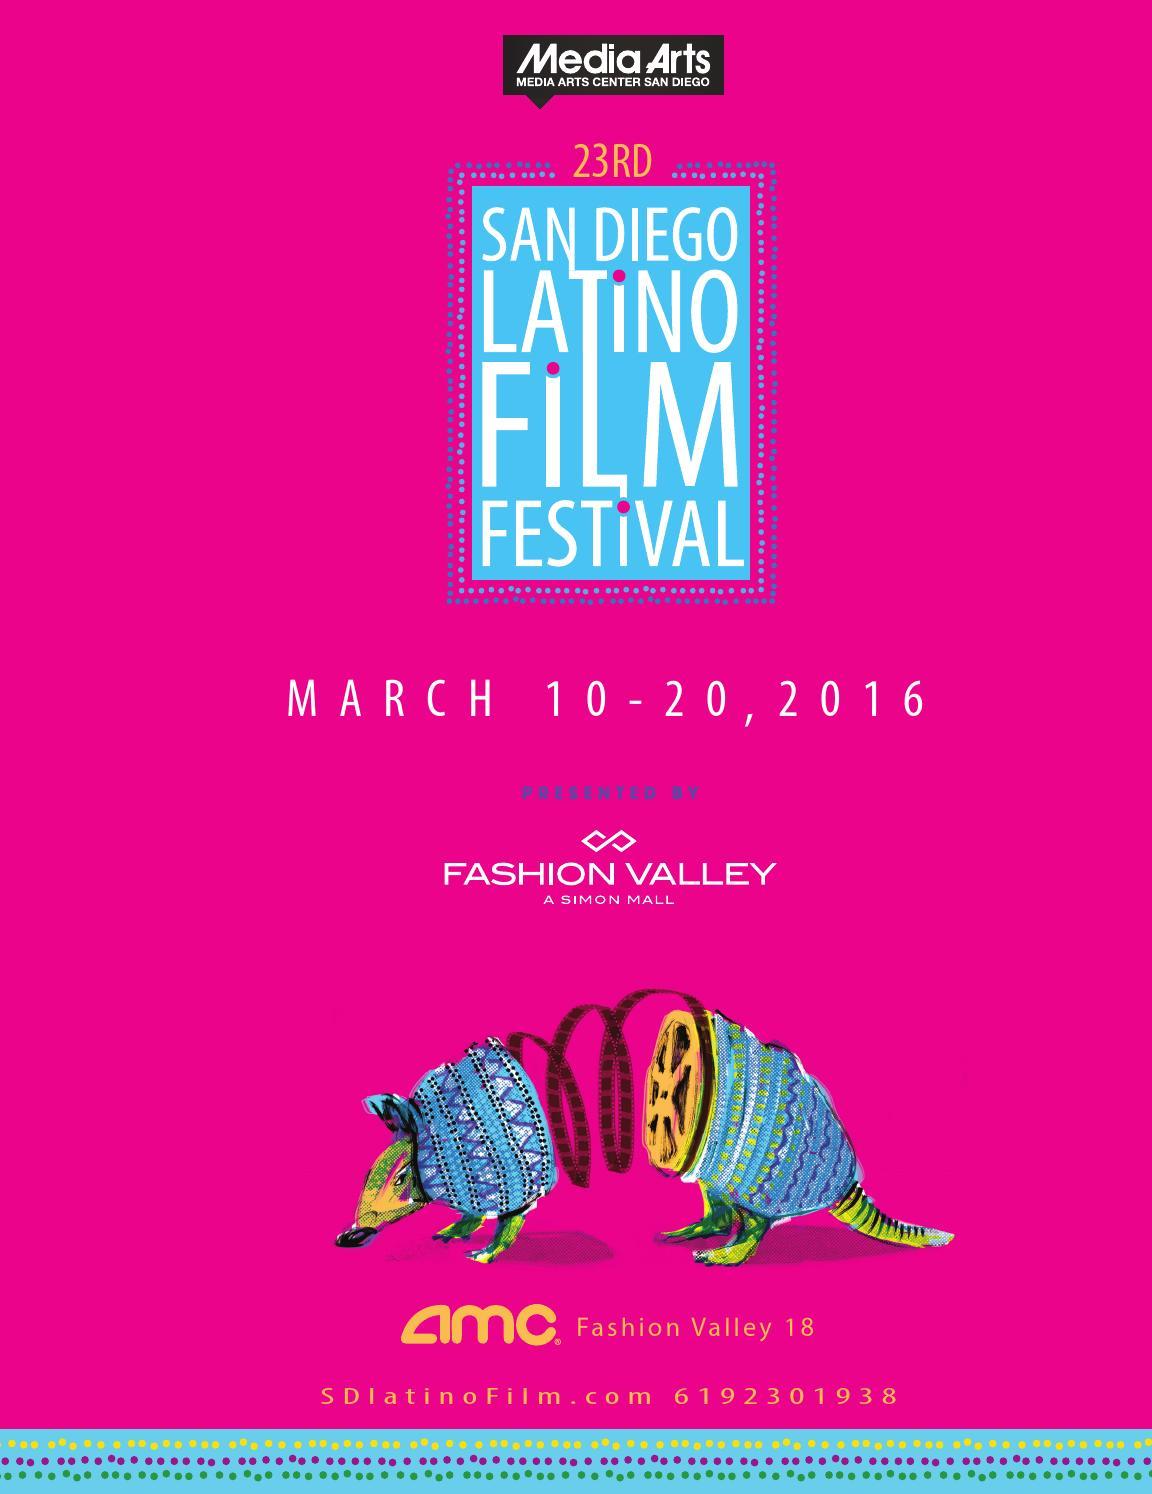 Belen Gimenez Desnuda san diego latino film festival catalogue 2016ethan